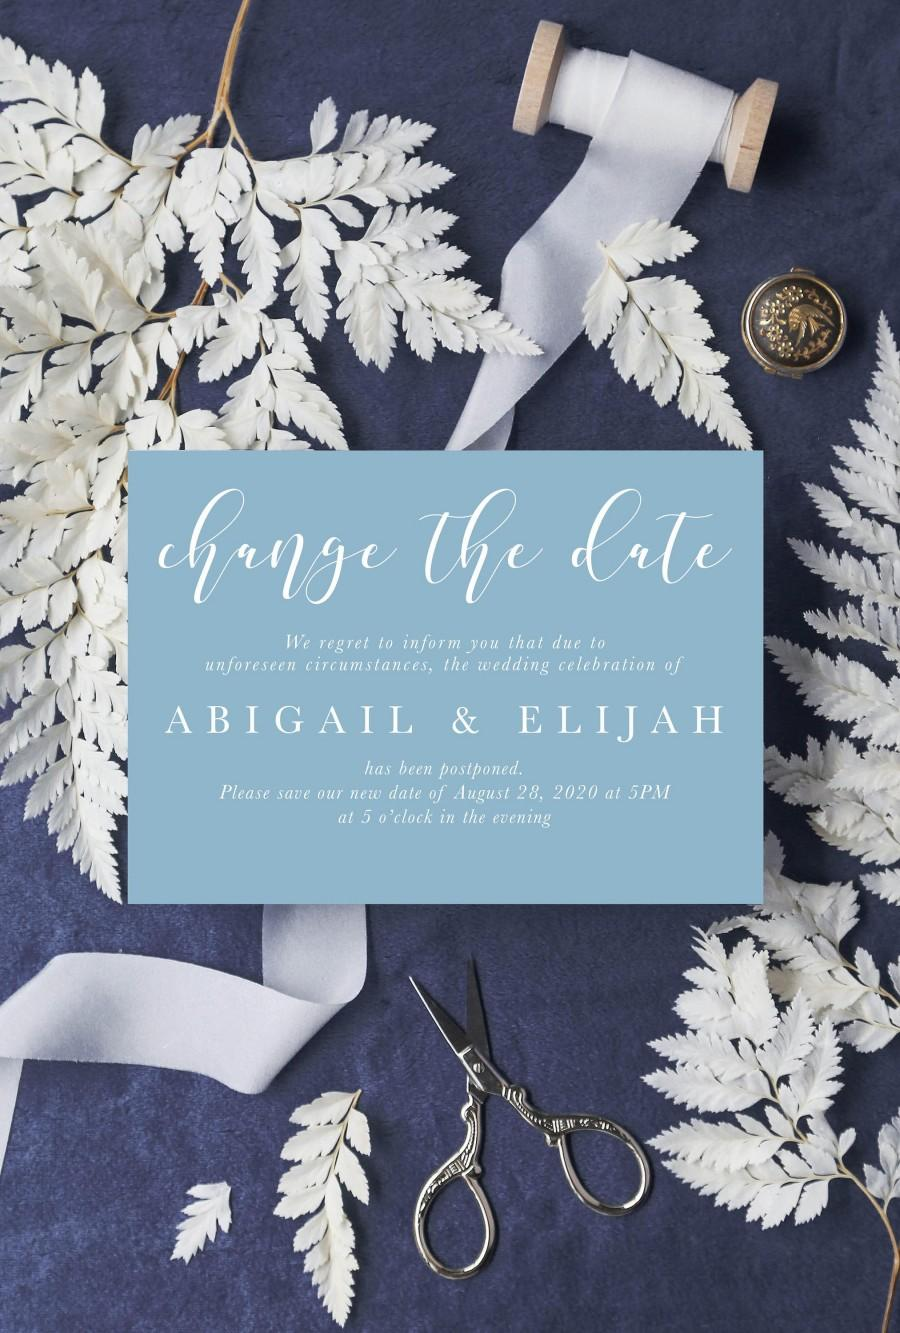 Свадьба - Addressed & Printed Wedding postponed postcard, Wedding postponement card, Save our new date postcard, Wedding announcement card